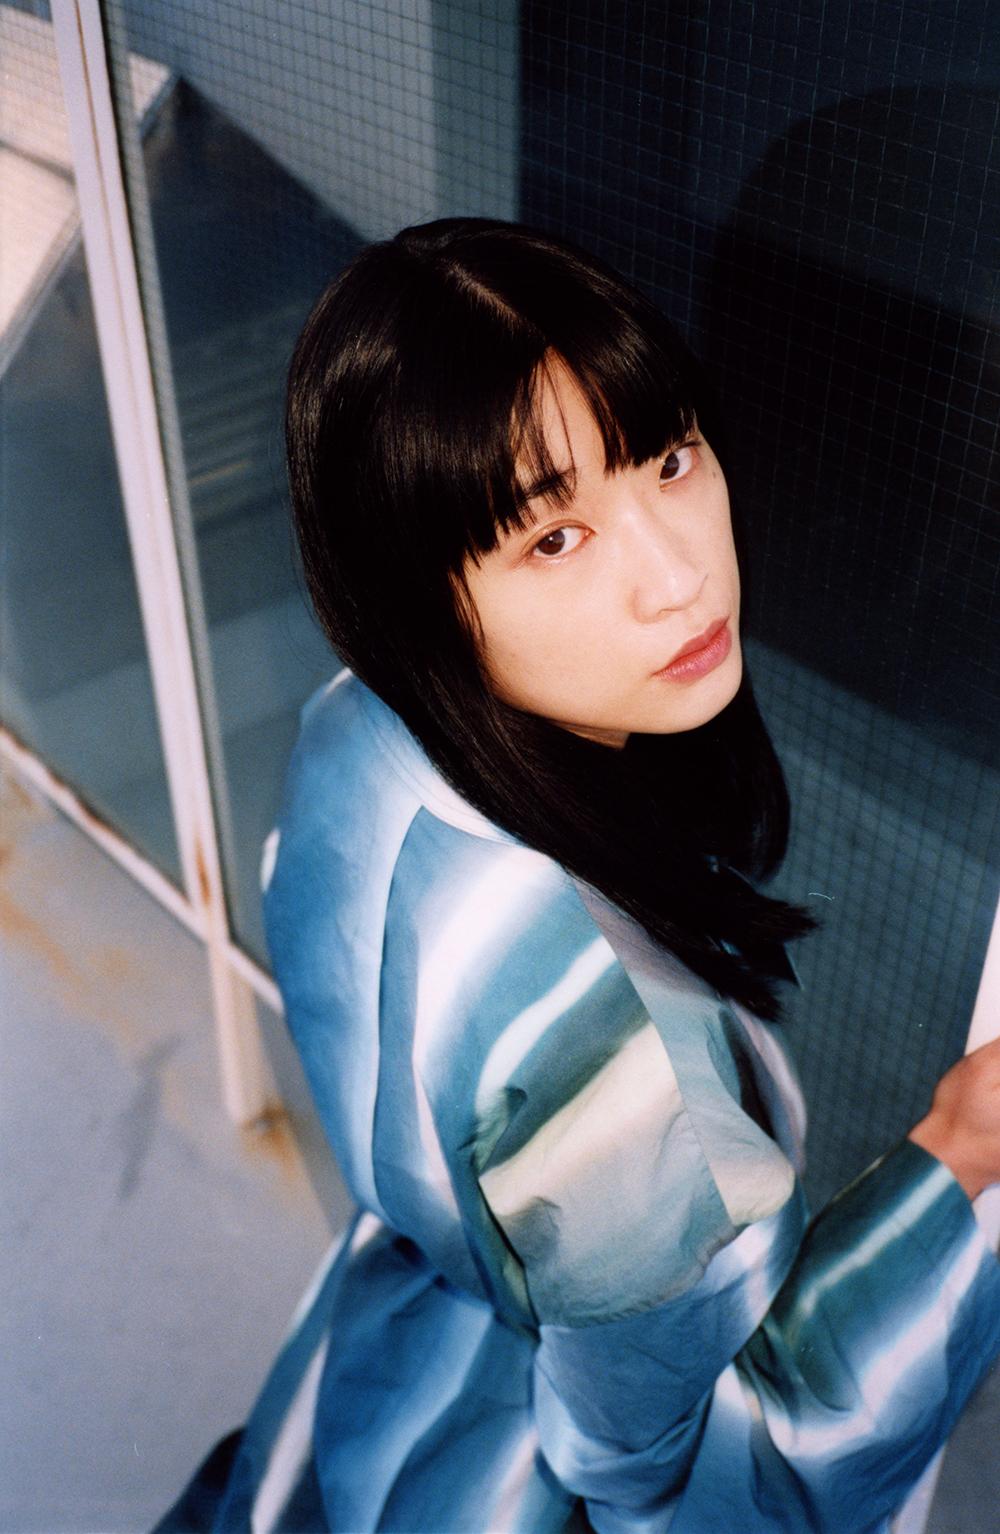 ZUCZUG_Tokyo Girls Campaign